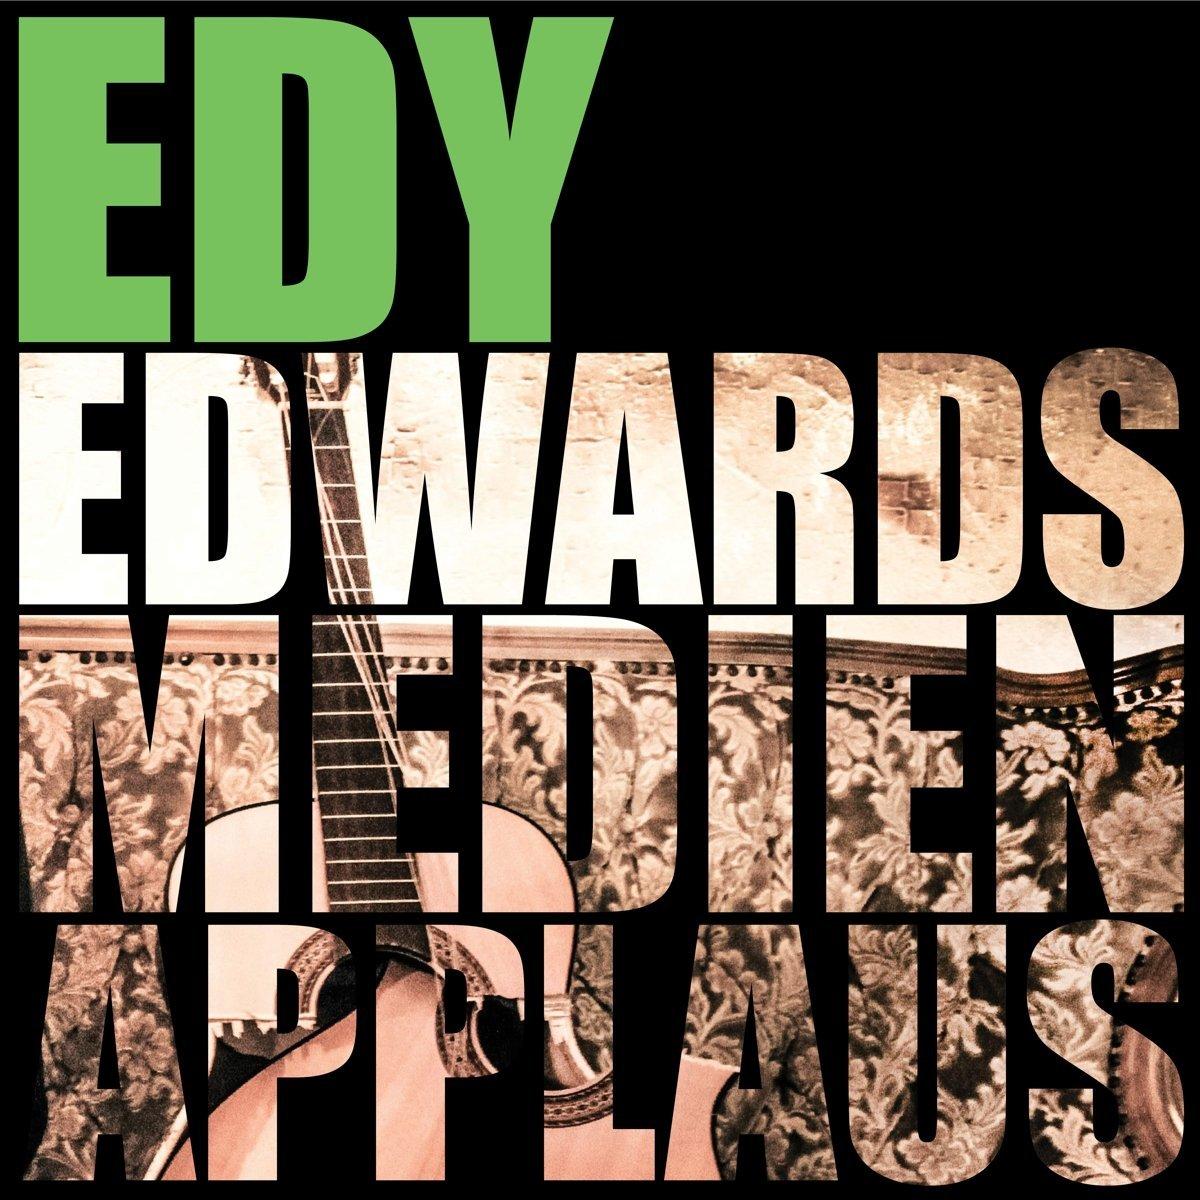 Edy Edwards: Medienapplaus [CD]